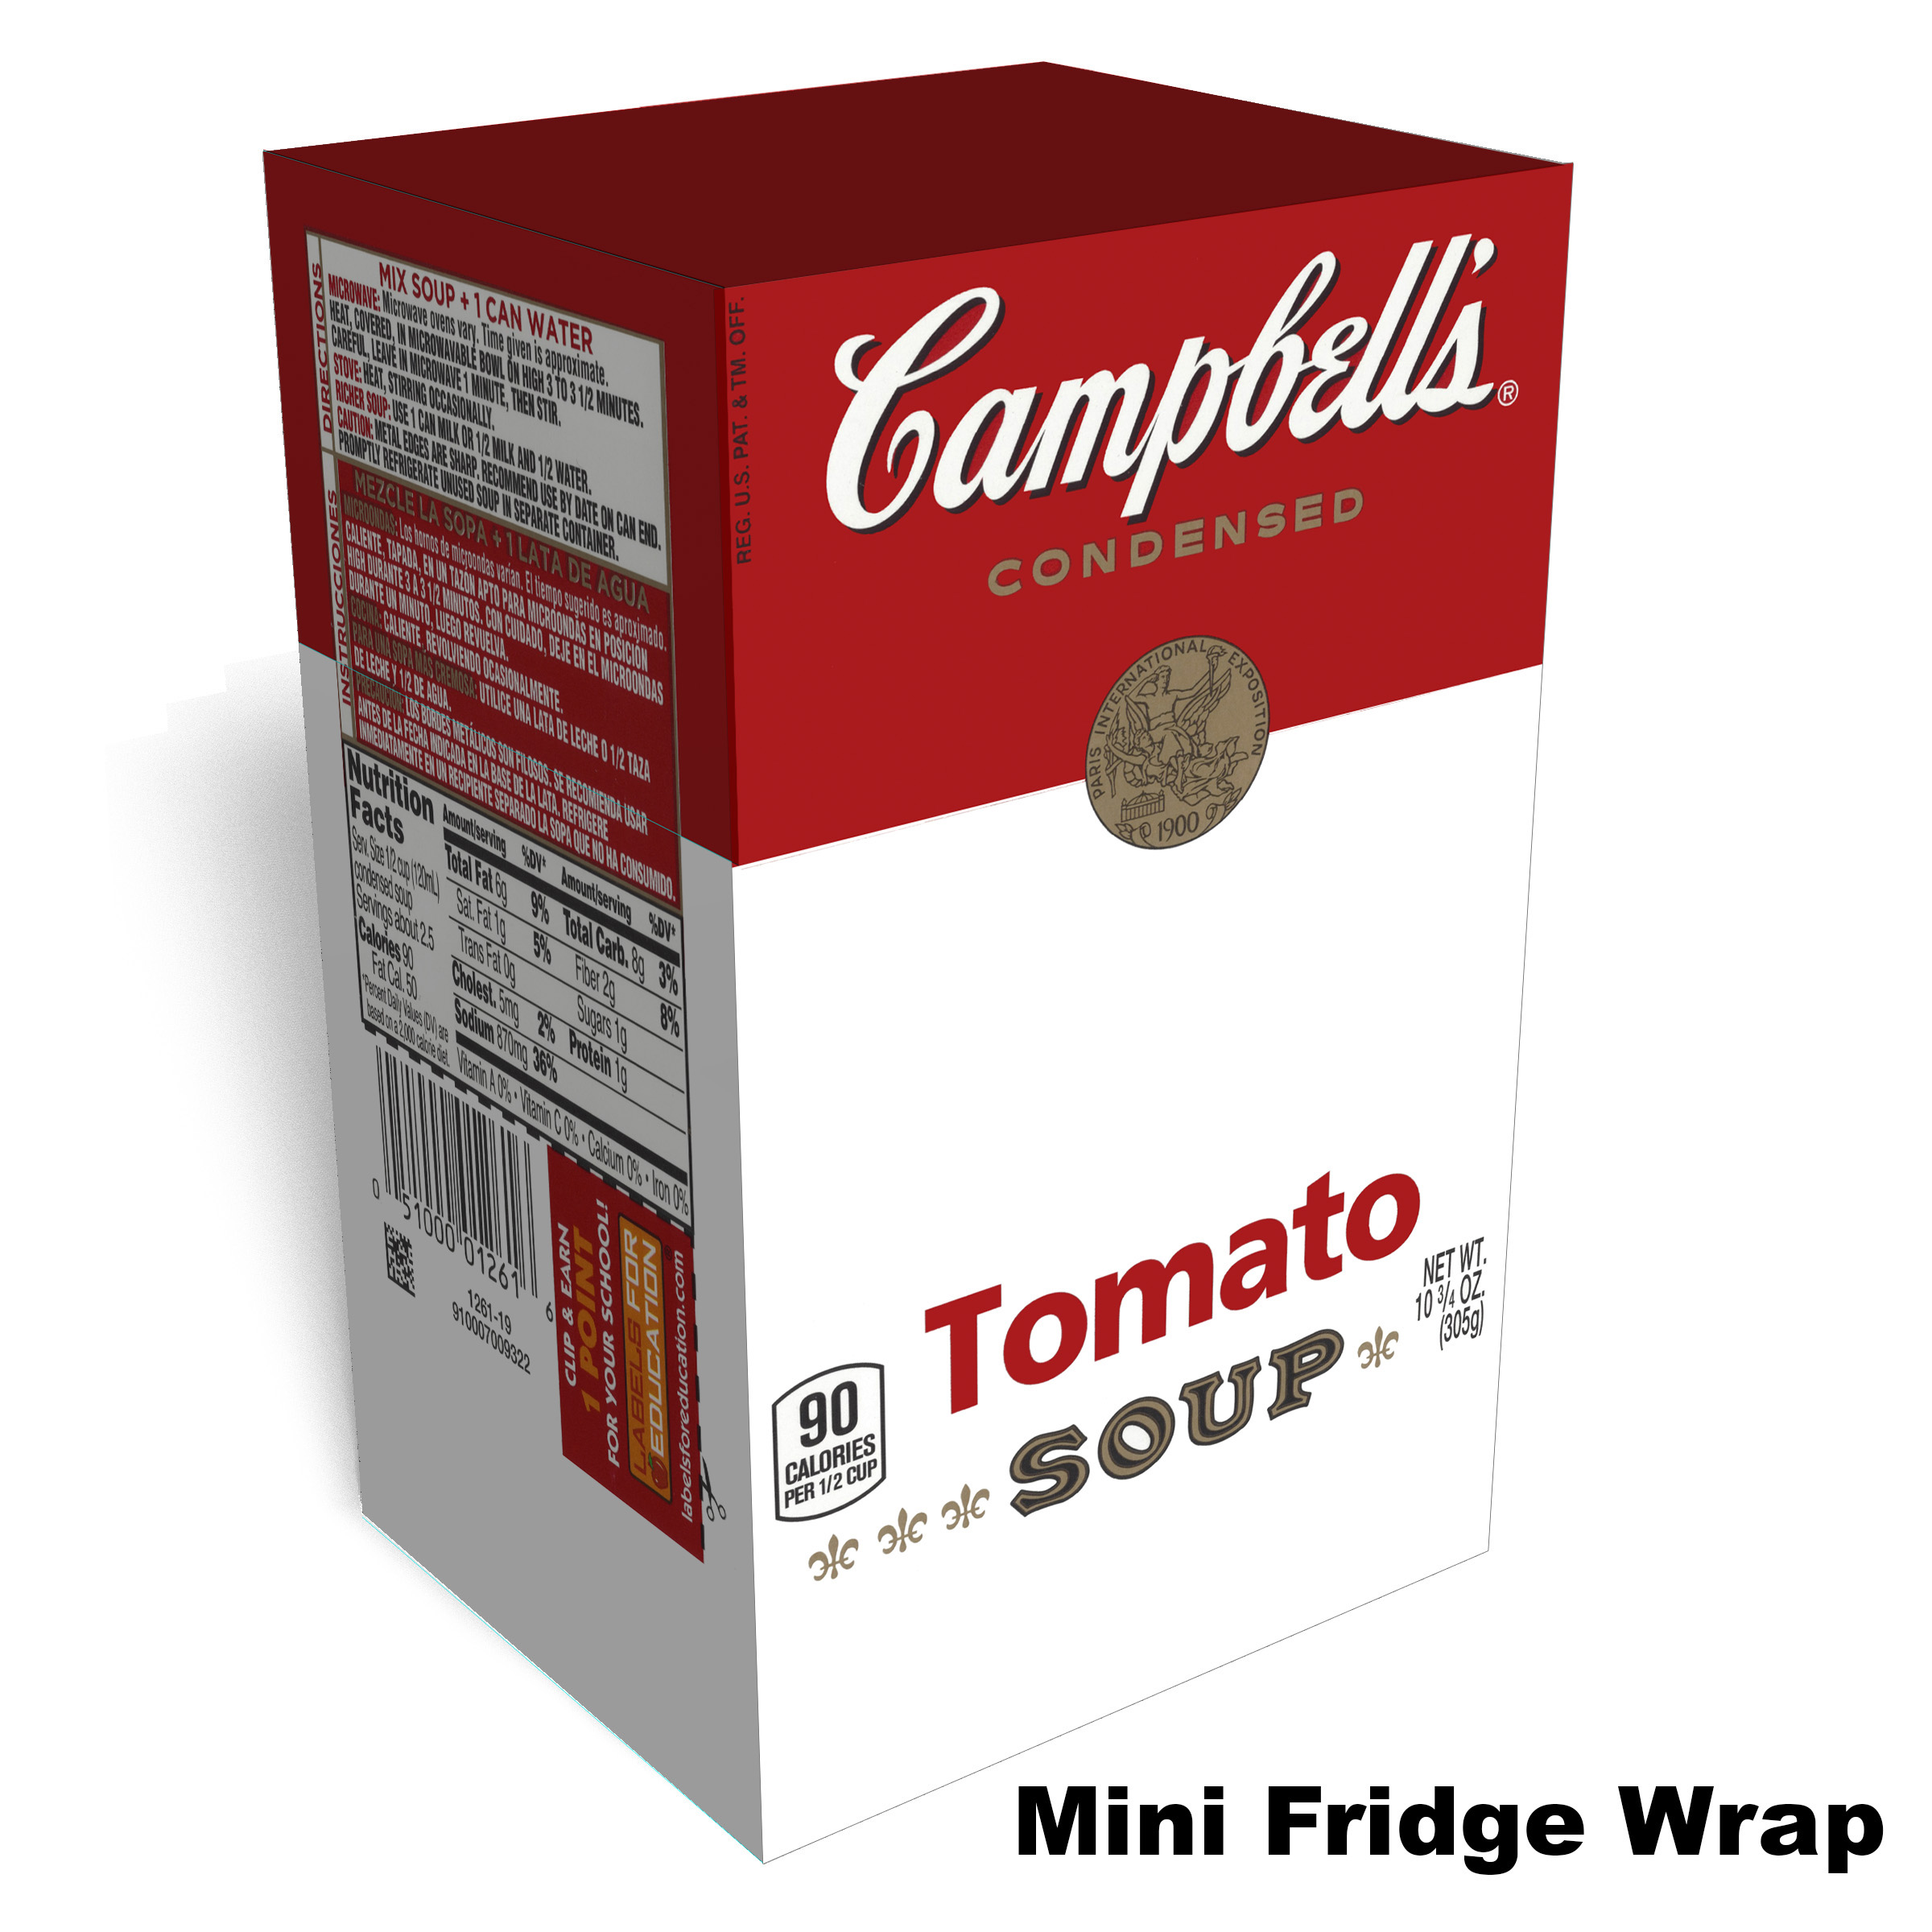 Campbells Tomato Soap Mini Fridge Skin